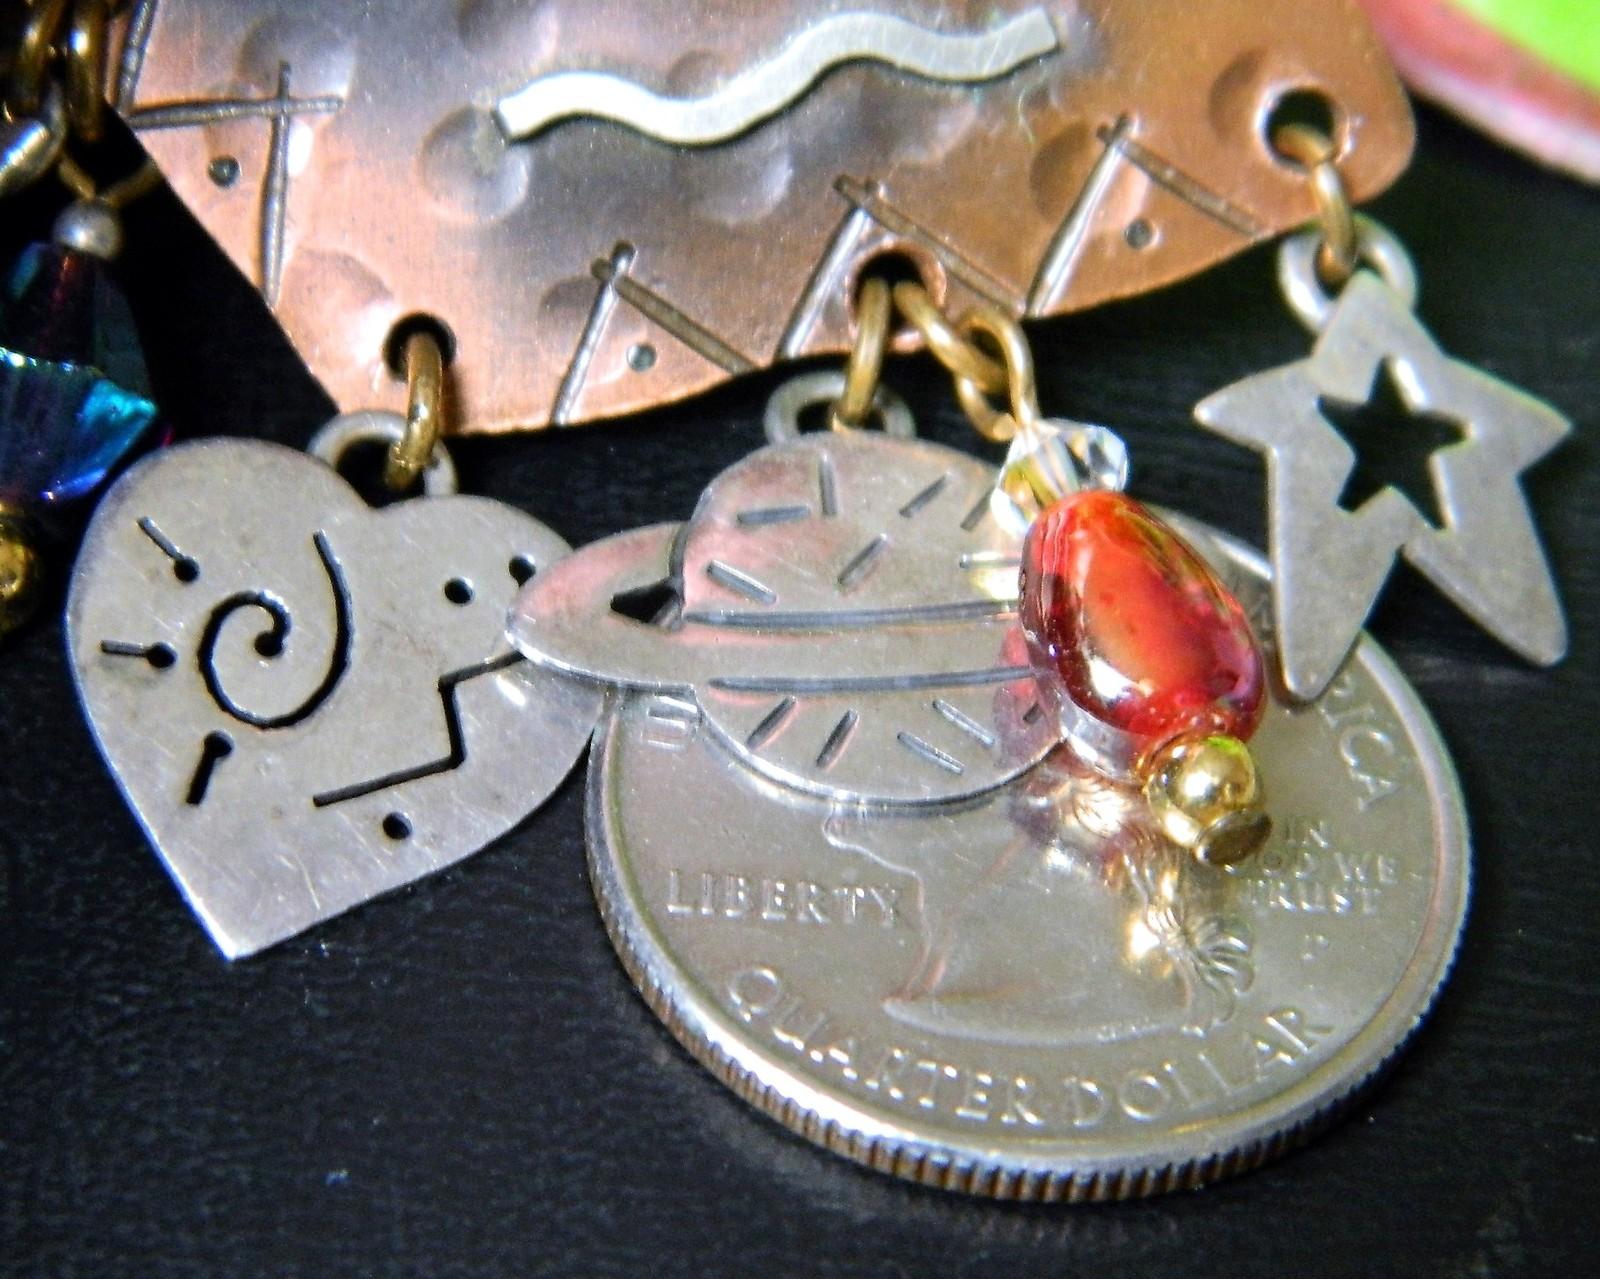 Vintage Mixed Metal Copper Silver Cobre Mexico Brooch Pin Star Moon